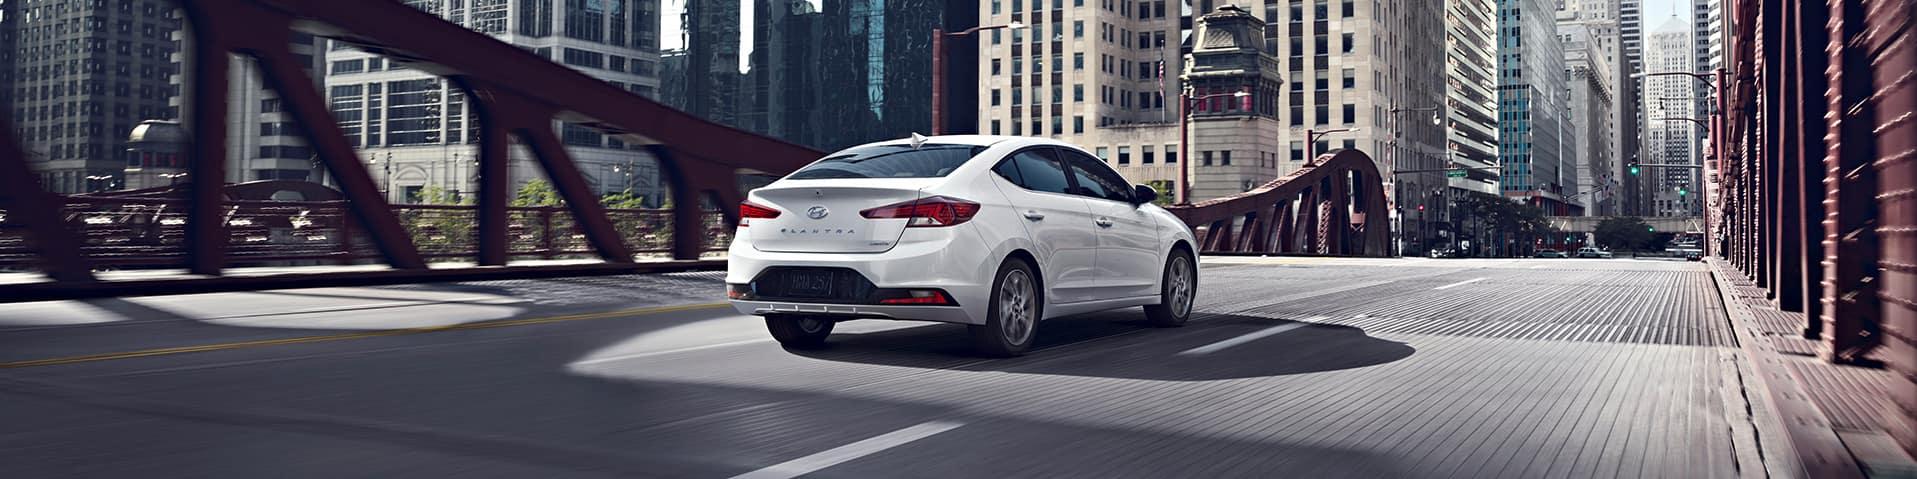 Boch Hyundai is a Luxury Car Dealership near Boston MD | White MY20 Hyundai Elantra driving across city bridge